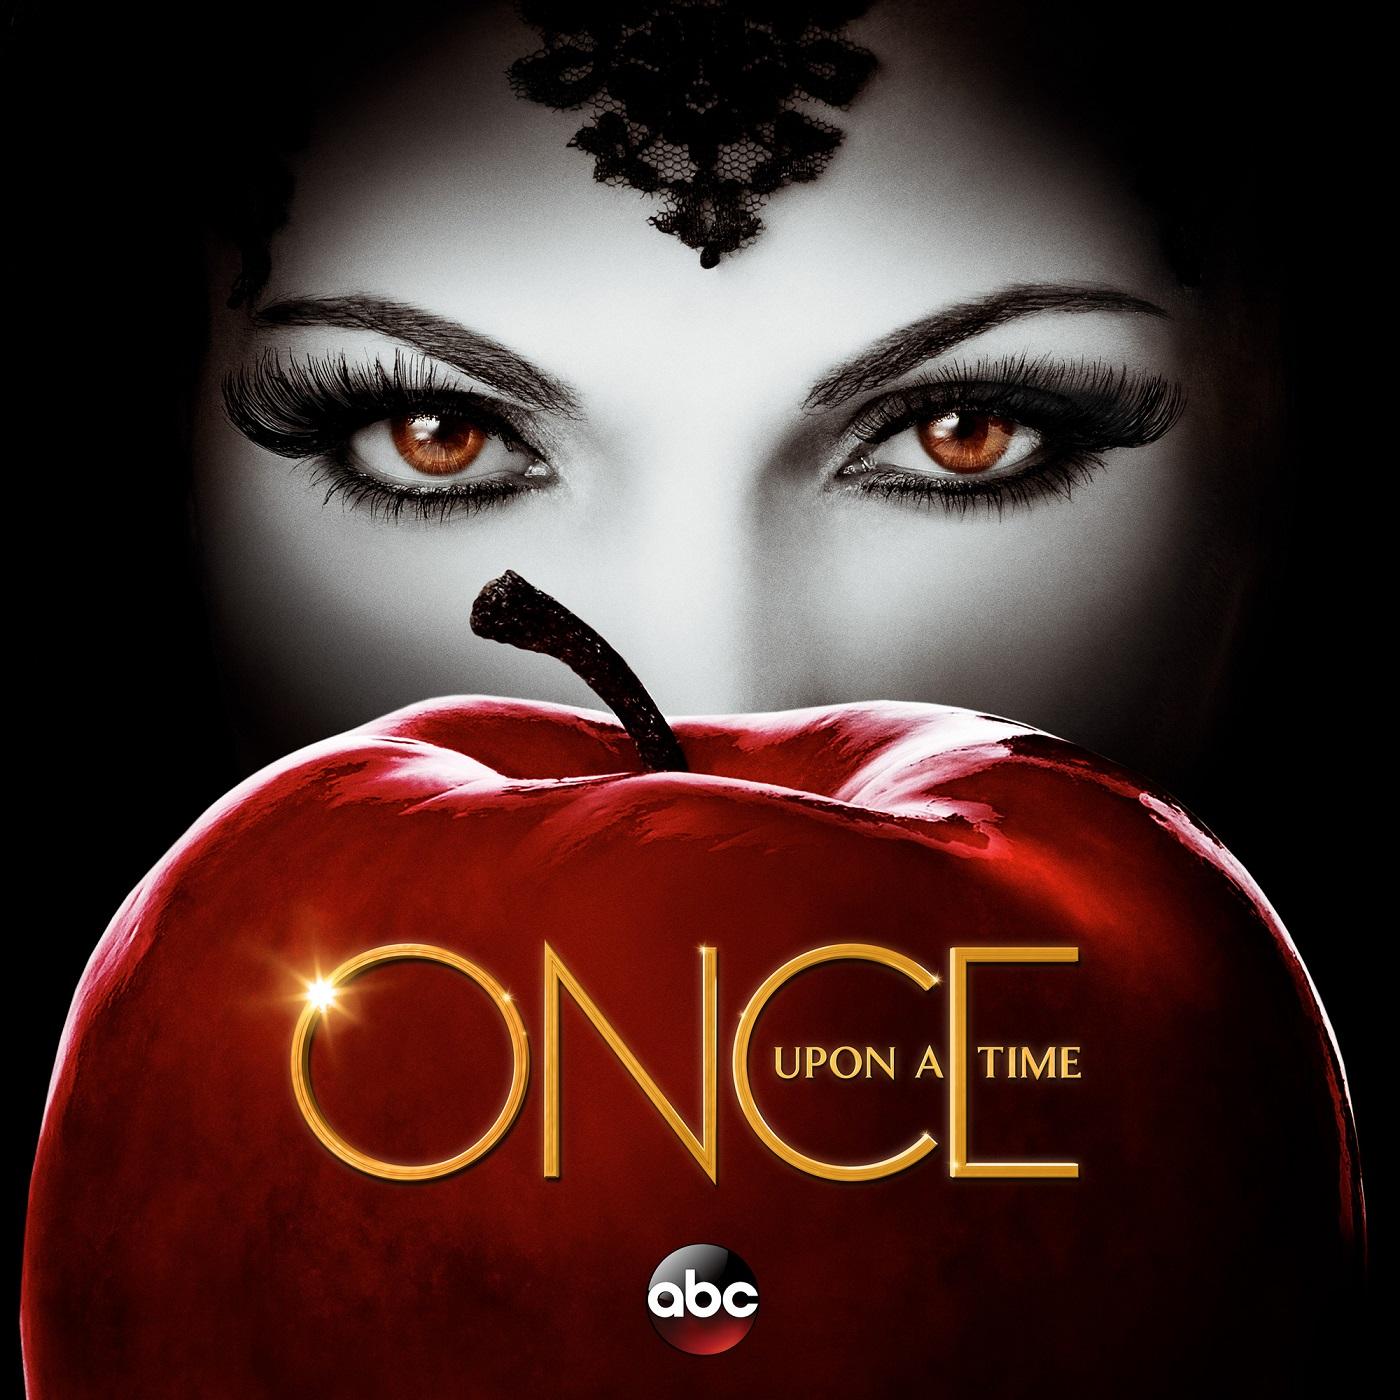 Once Upon A Time S05 720p 1080p WEB DL | S05E01-E09 8z8m